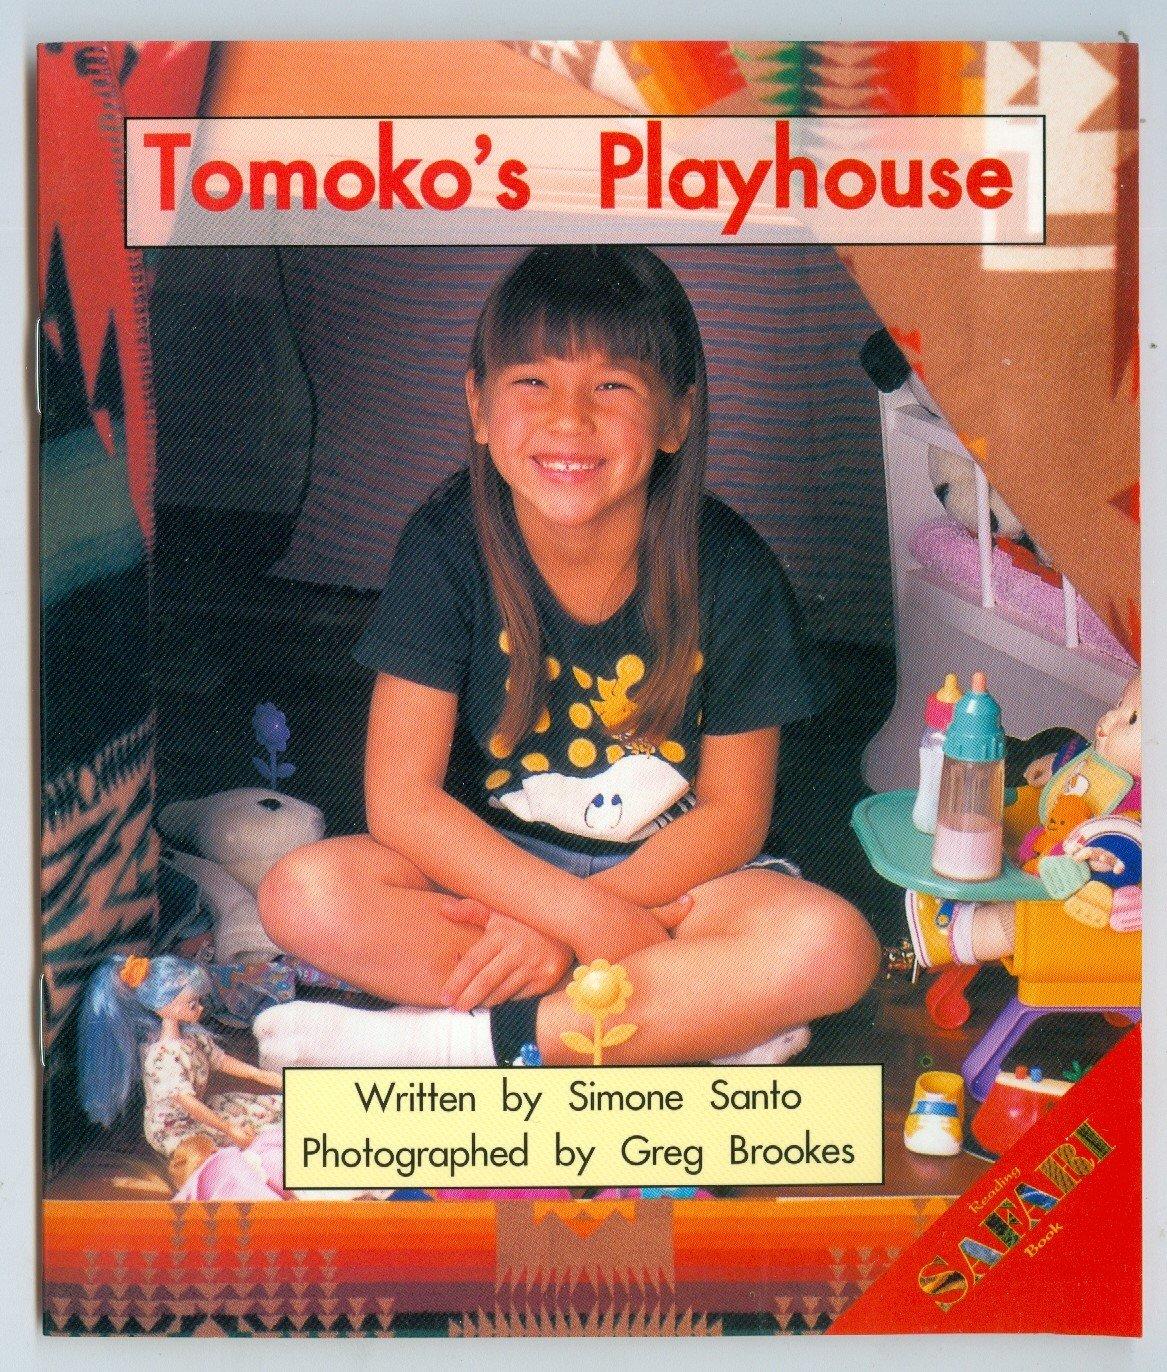 Brookes playhouse